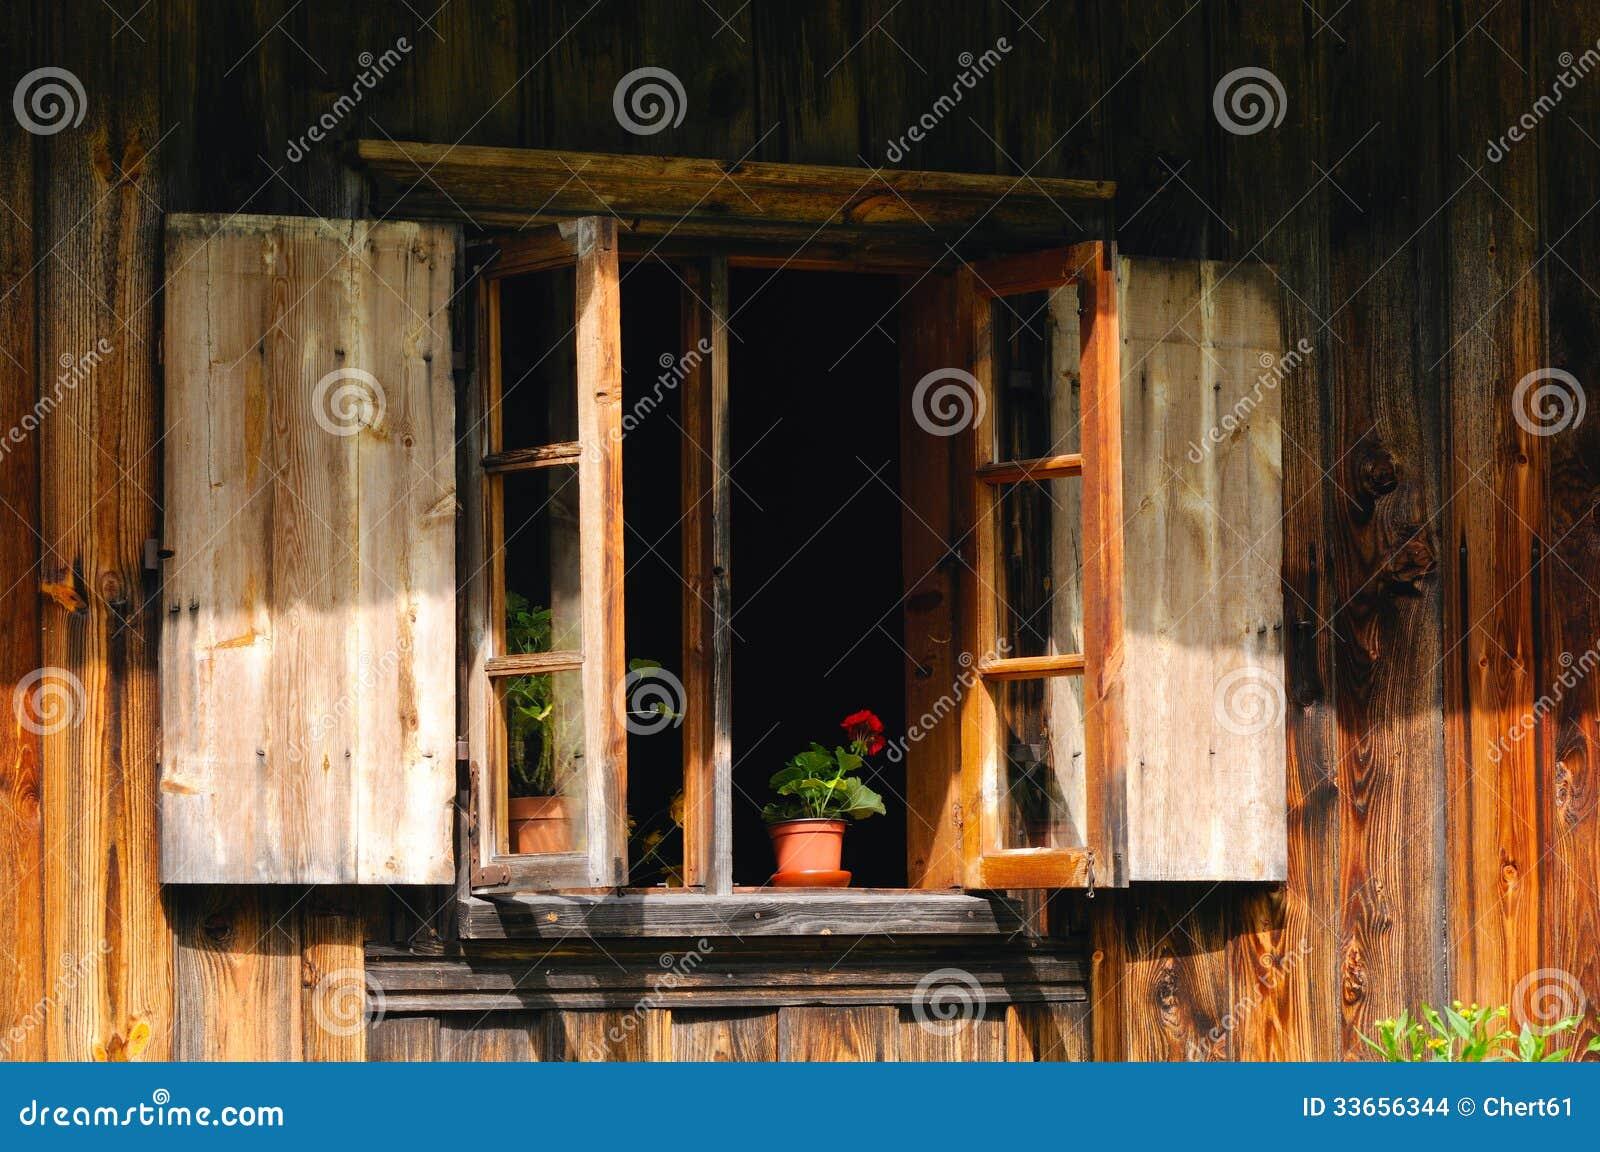 Opened Window Stock Images - Image: 33656344